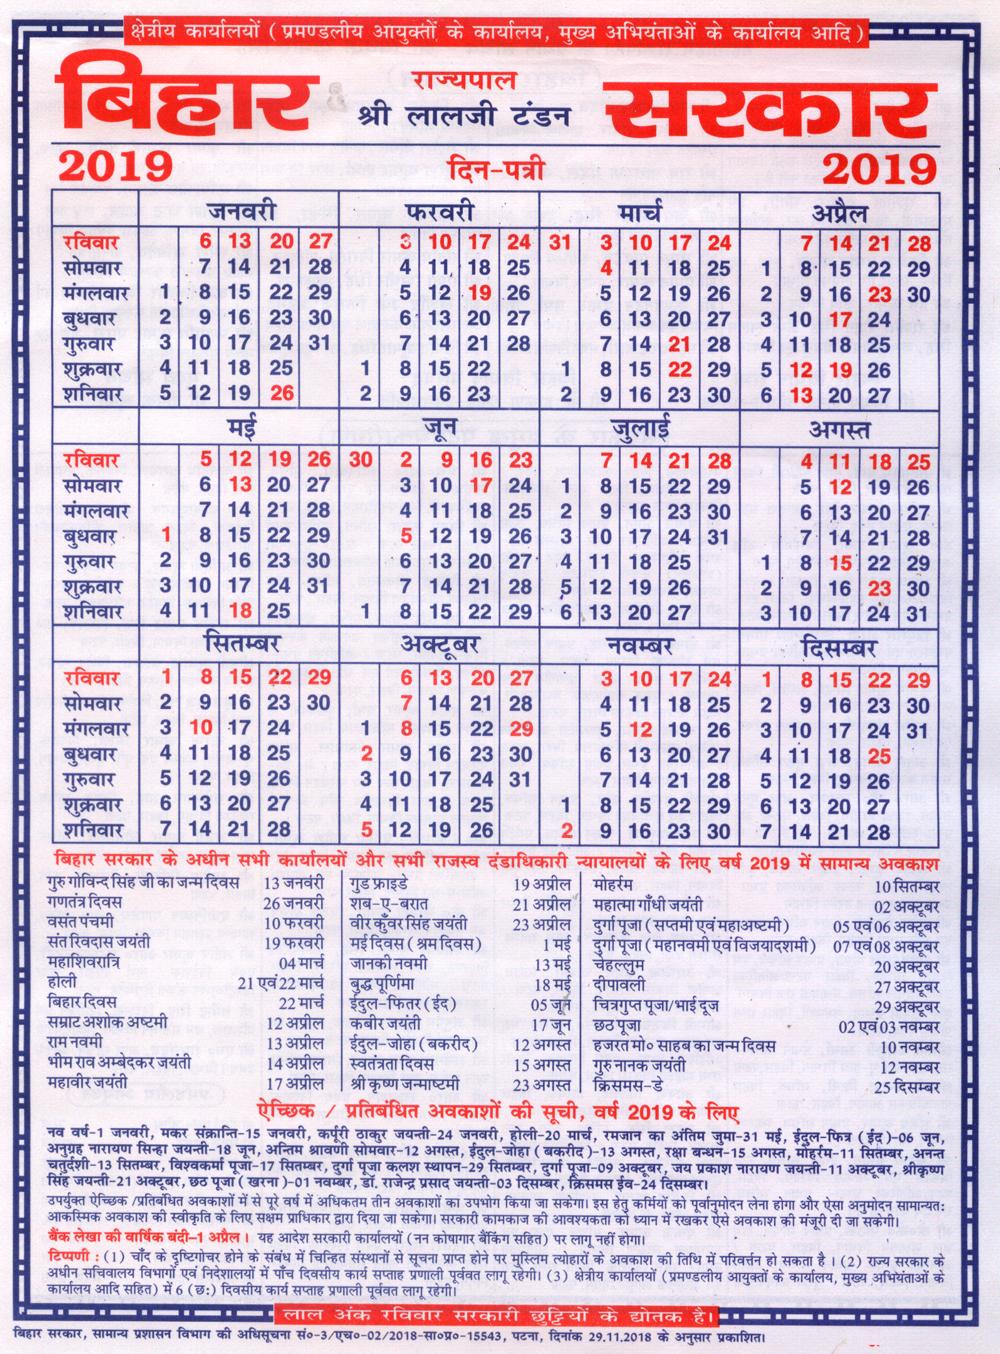 Download Bihar Sarkar Calendar 2020 | Calendar For Planning in Bihar Government Calander